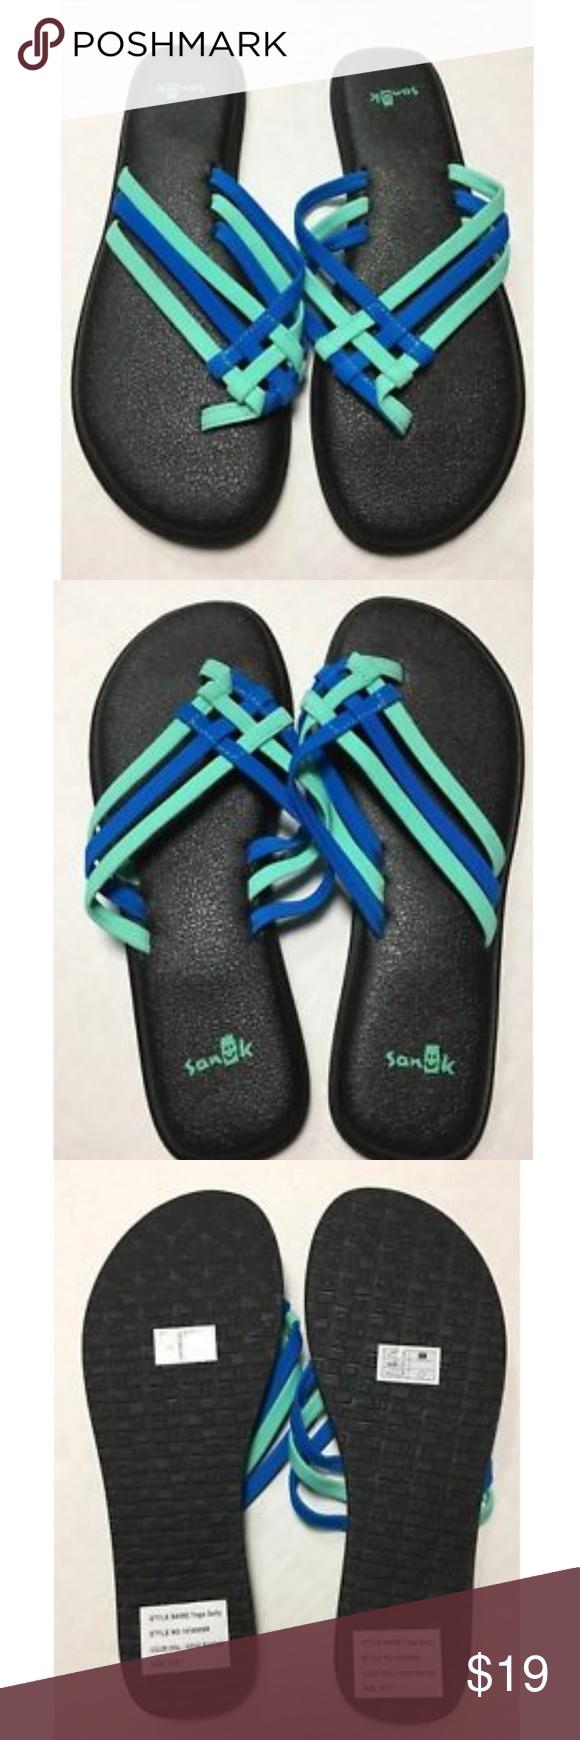 7ea085c20 Sanuk Yoga Salty Opal Indigo Bunting Sandals New Sanuk Yoga Salty Opal  Indigo Bunting Womens Size 7 Brand New Without Box. Will be shipped in  original Sanuk ...